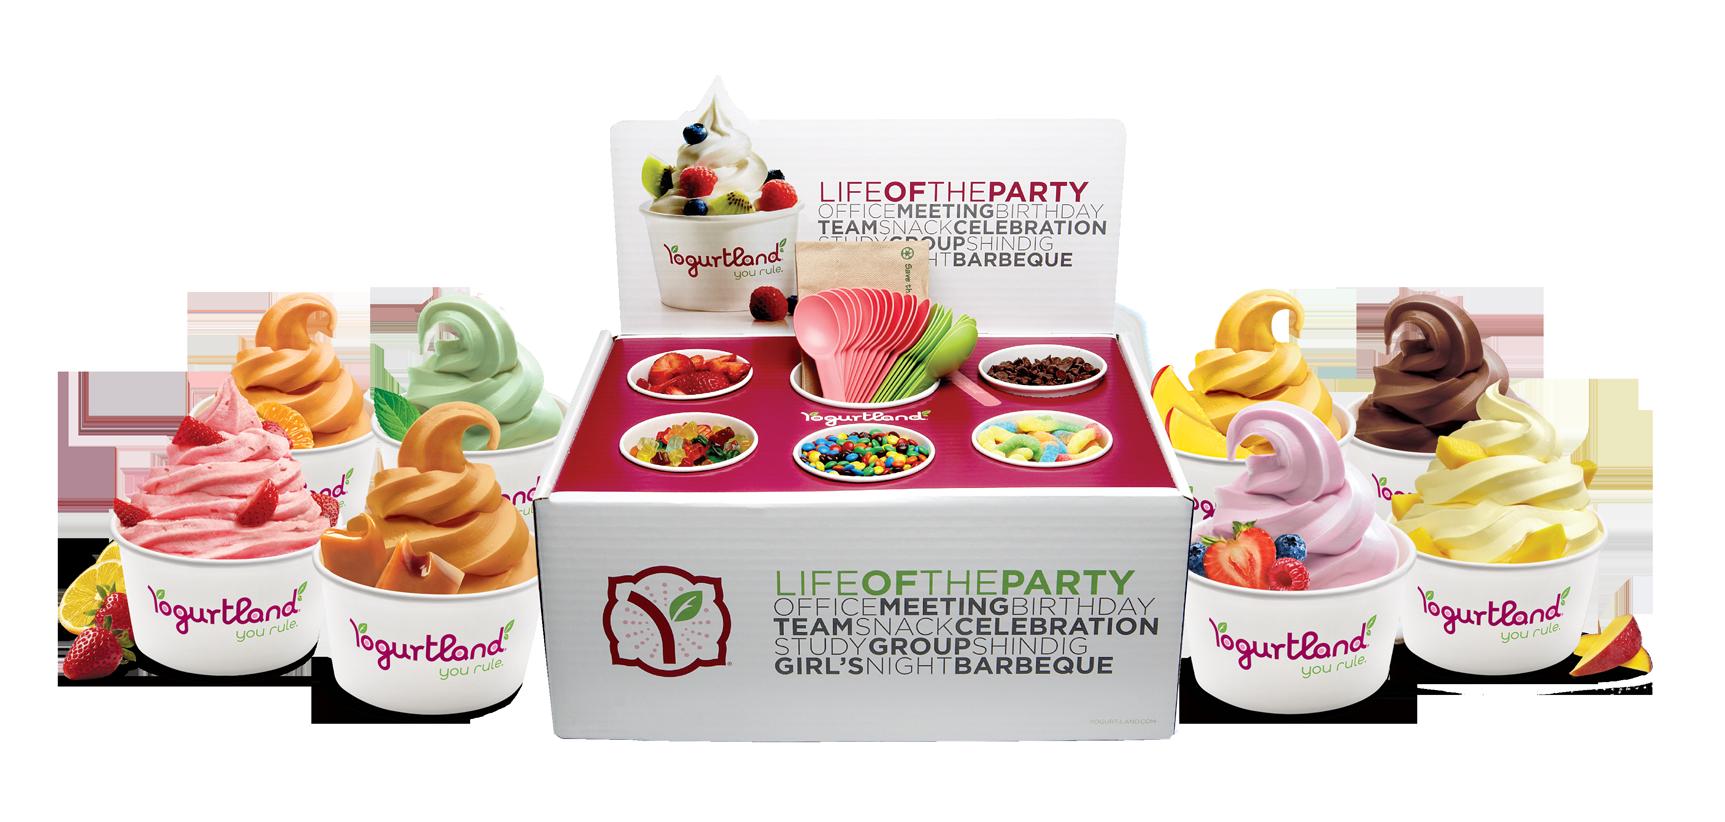 yogurtland catering pack